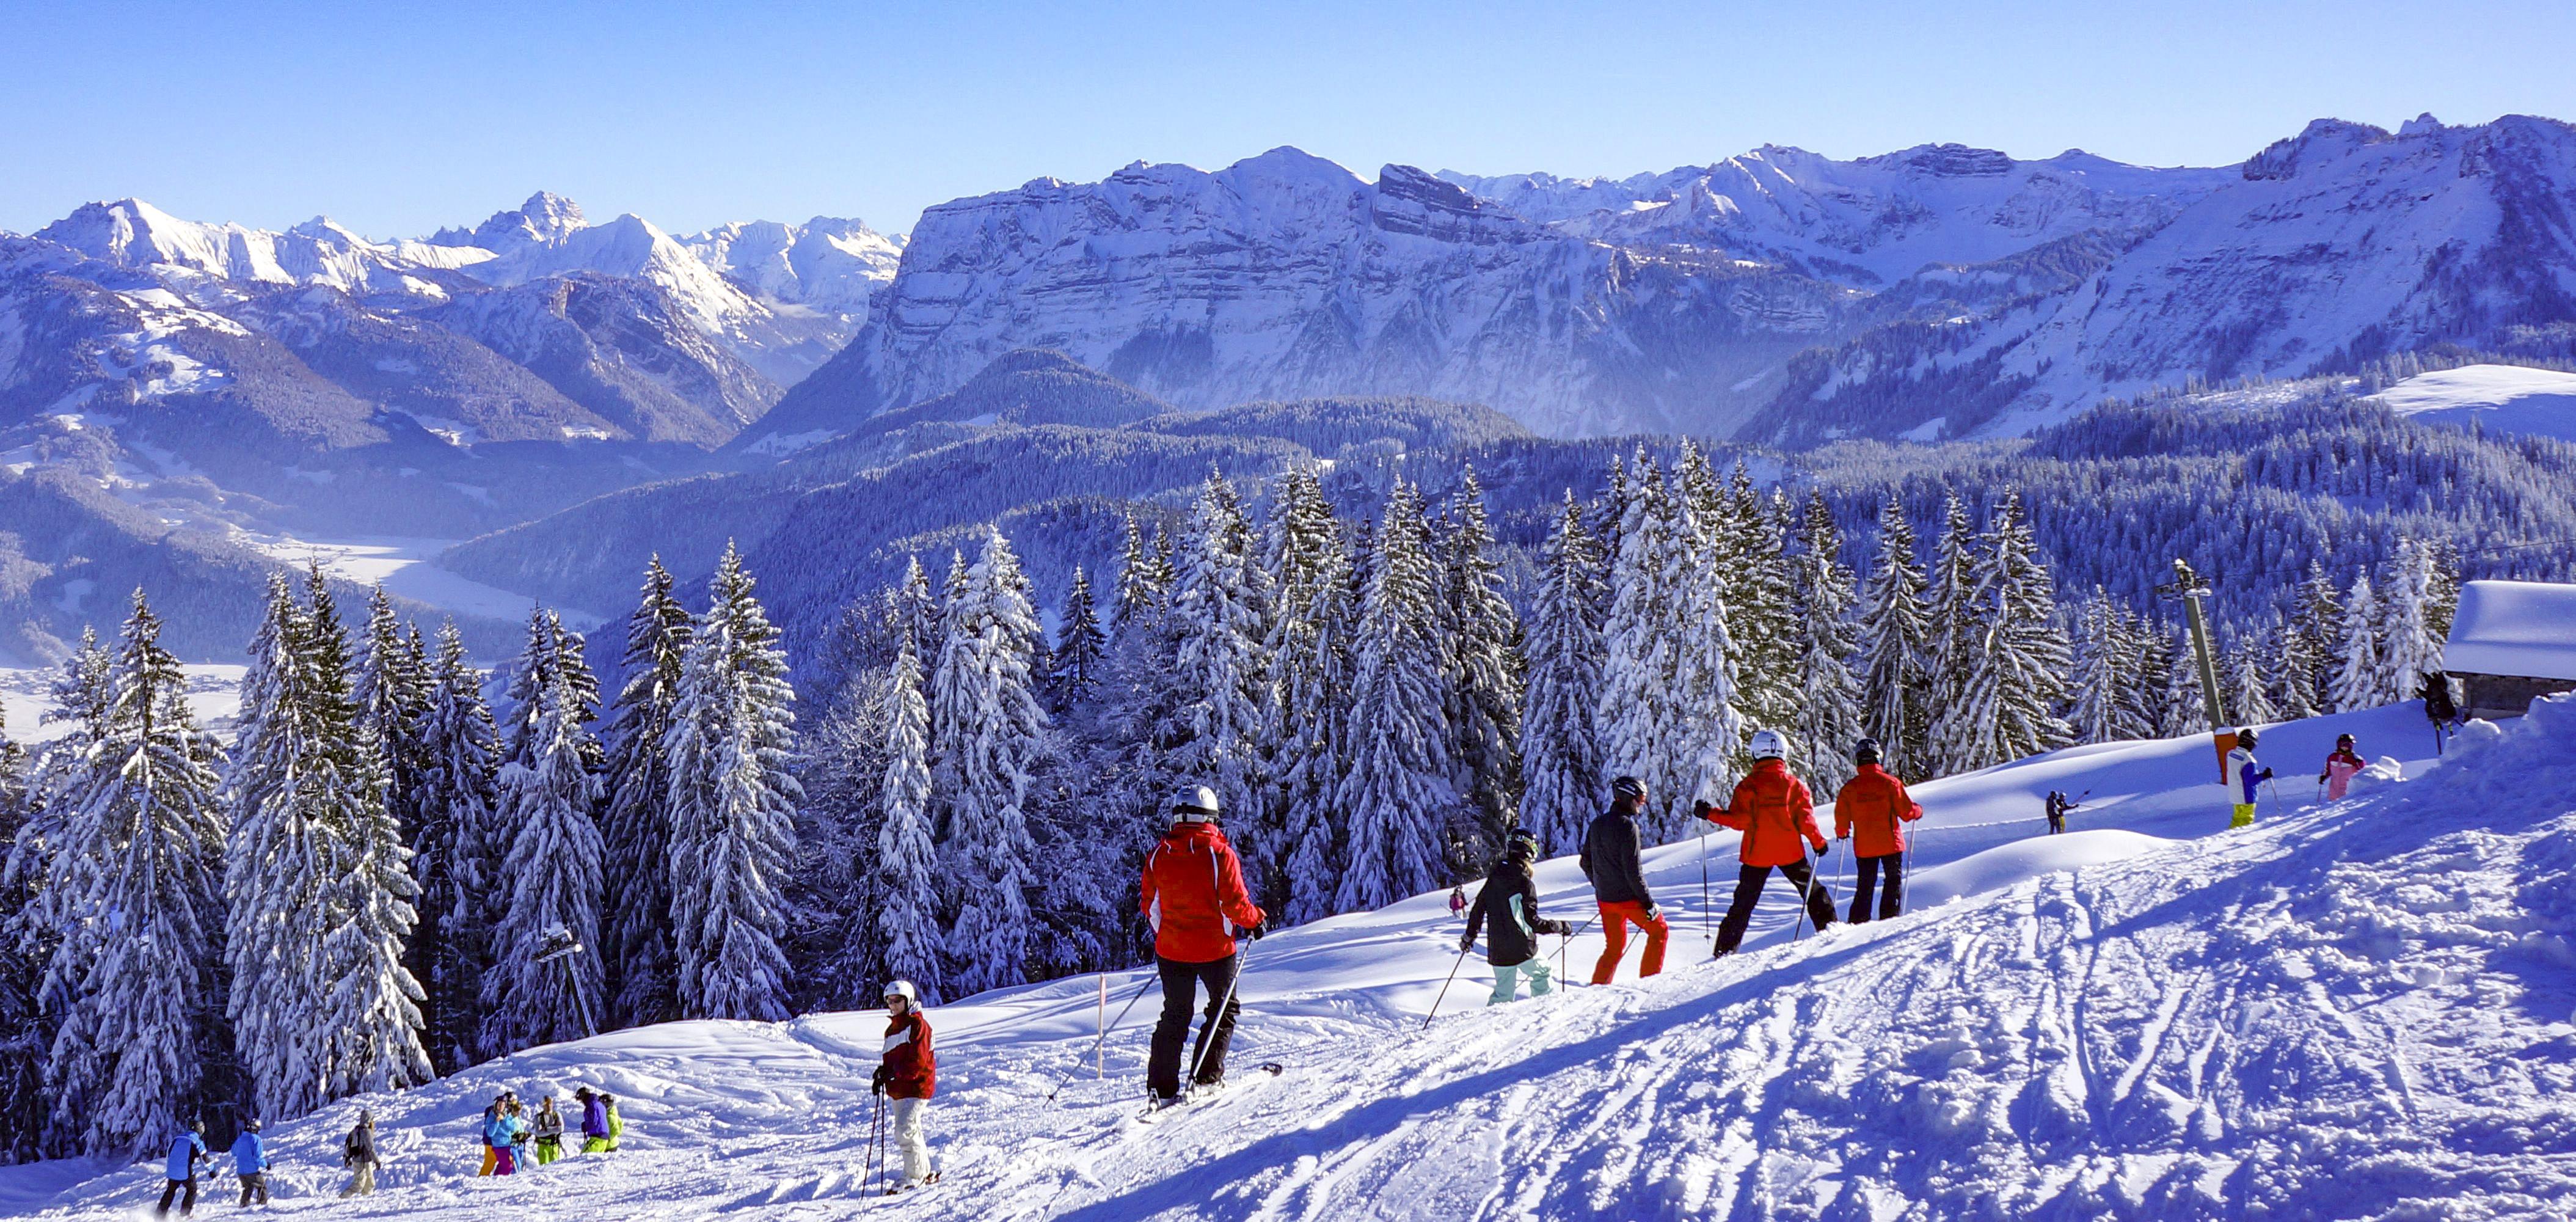 Skigebiet Bödele, Alpenblick Bergstation / Copyright© Alois Metzler